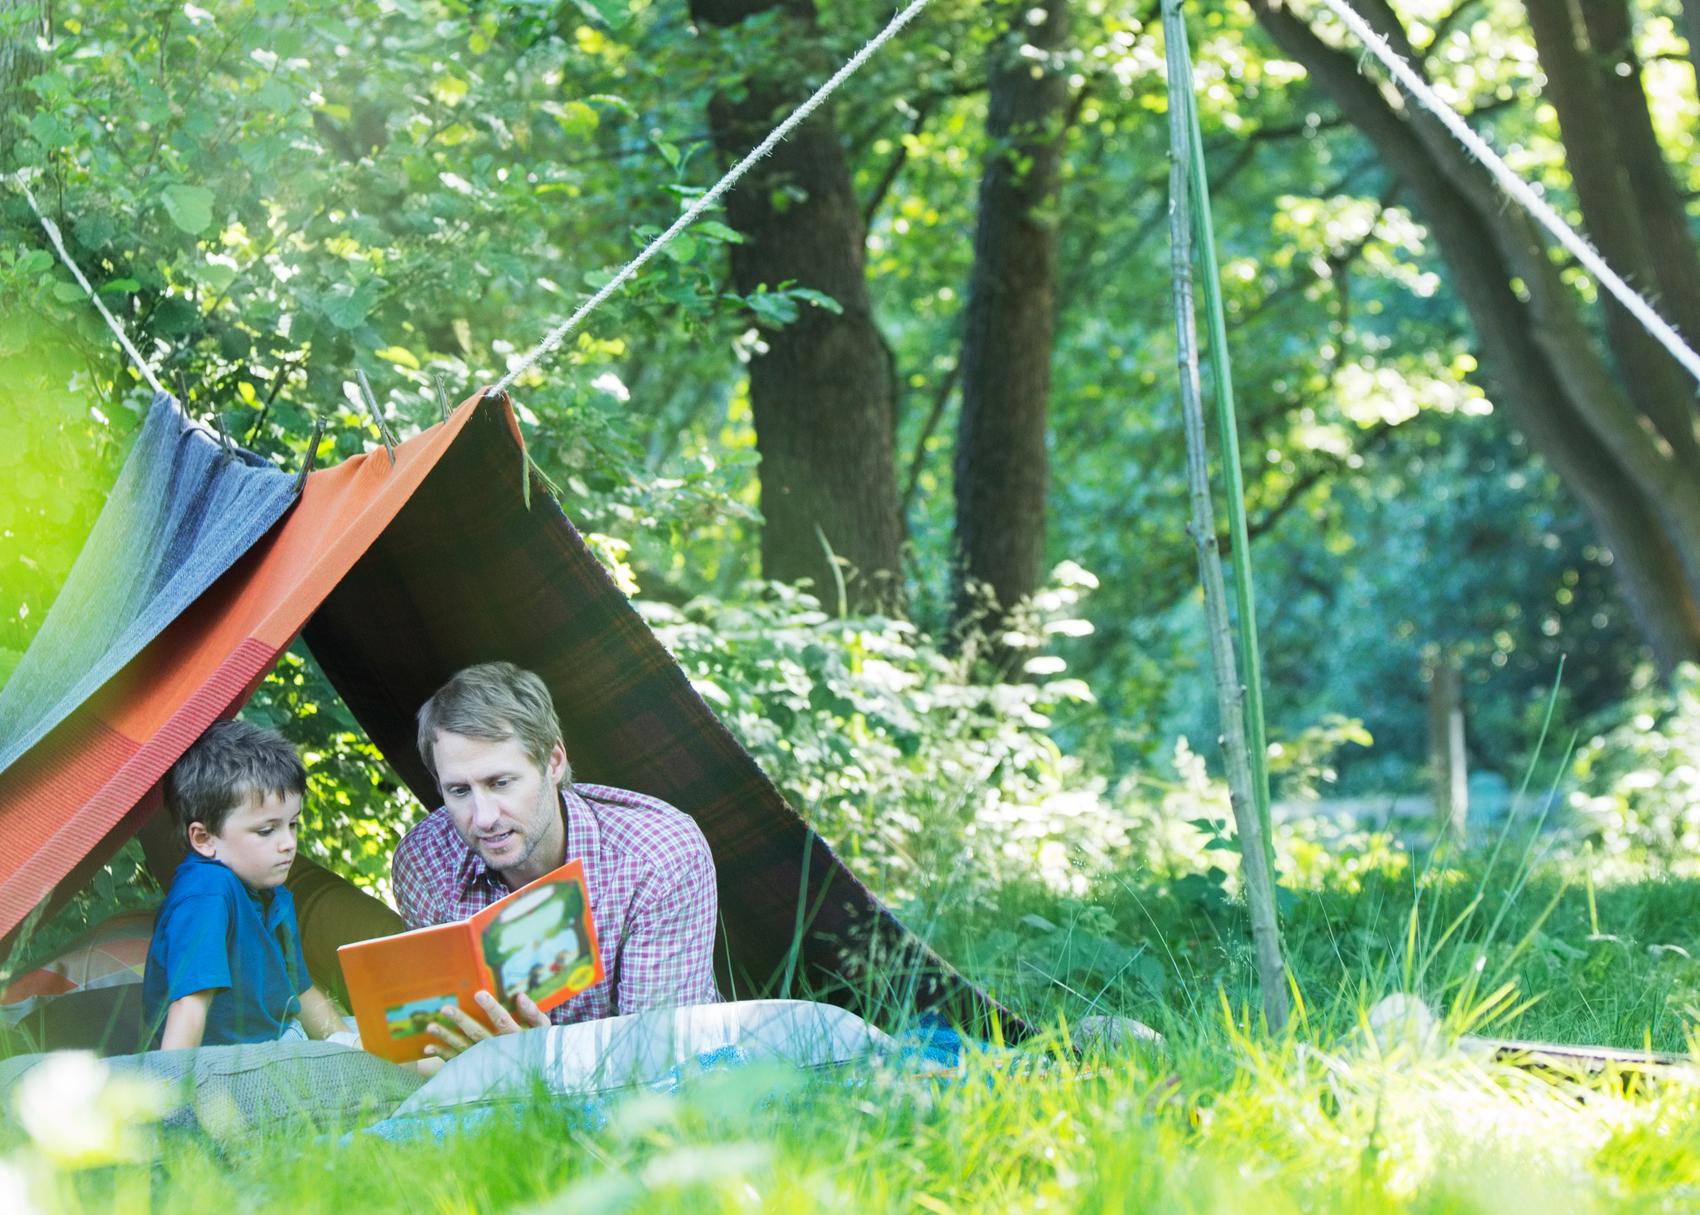 Summer Reading, Having a Blast - cover